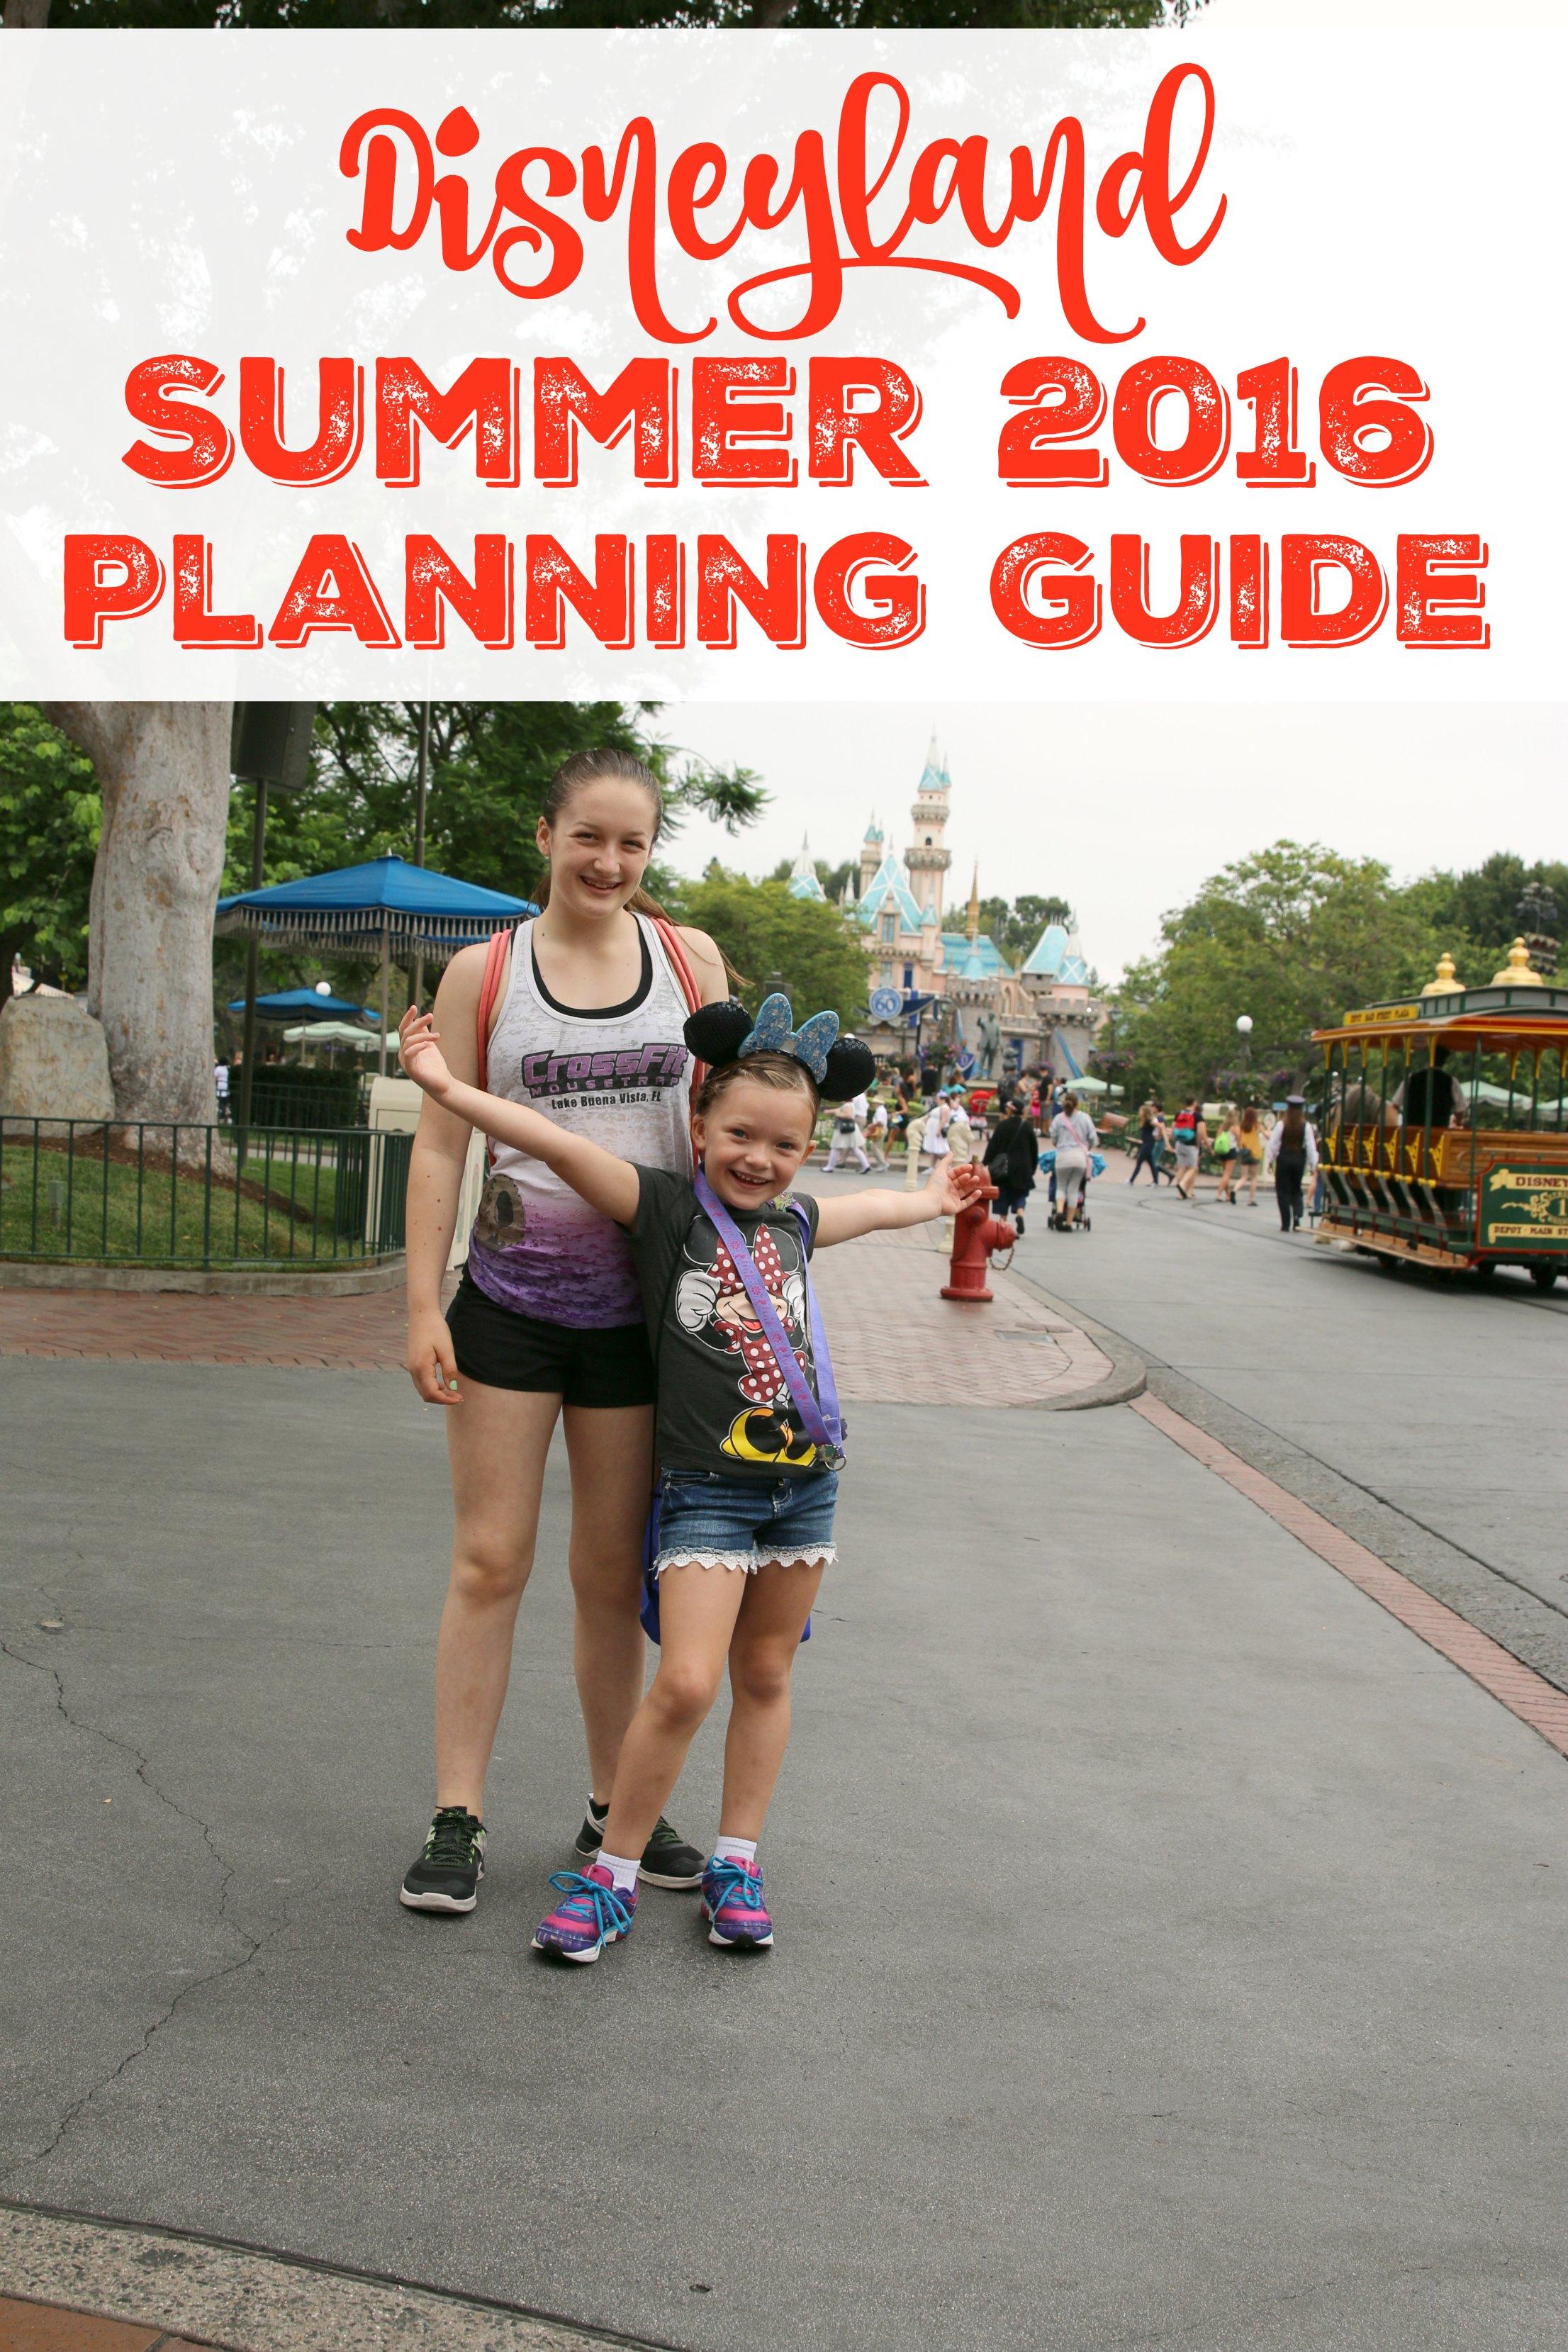 Disneyland Summer 2016 Planning Guide